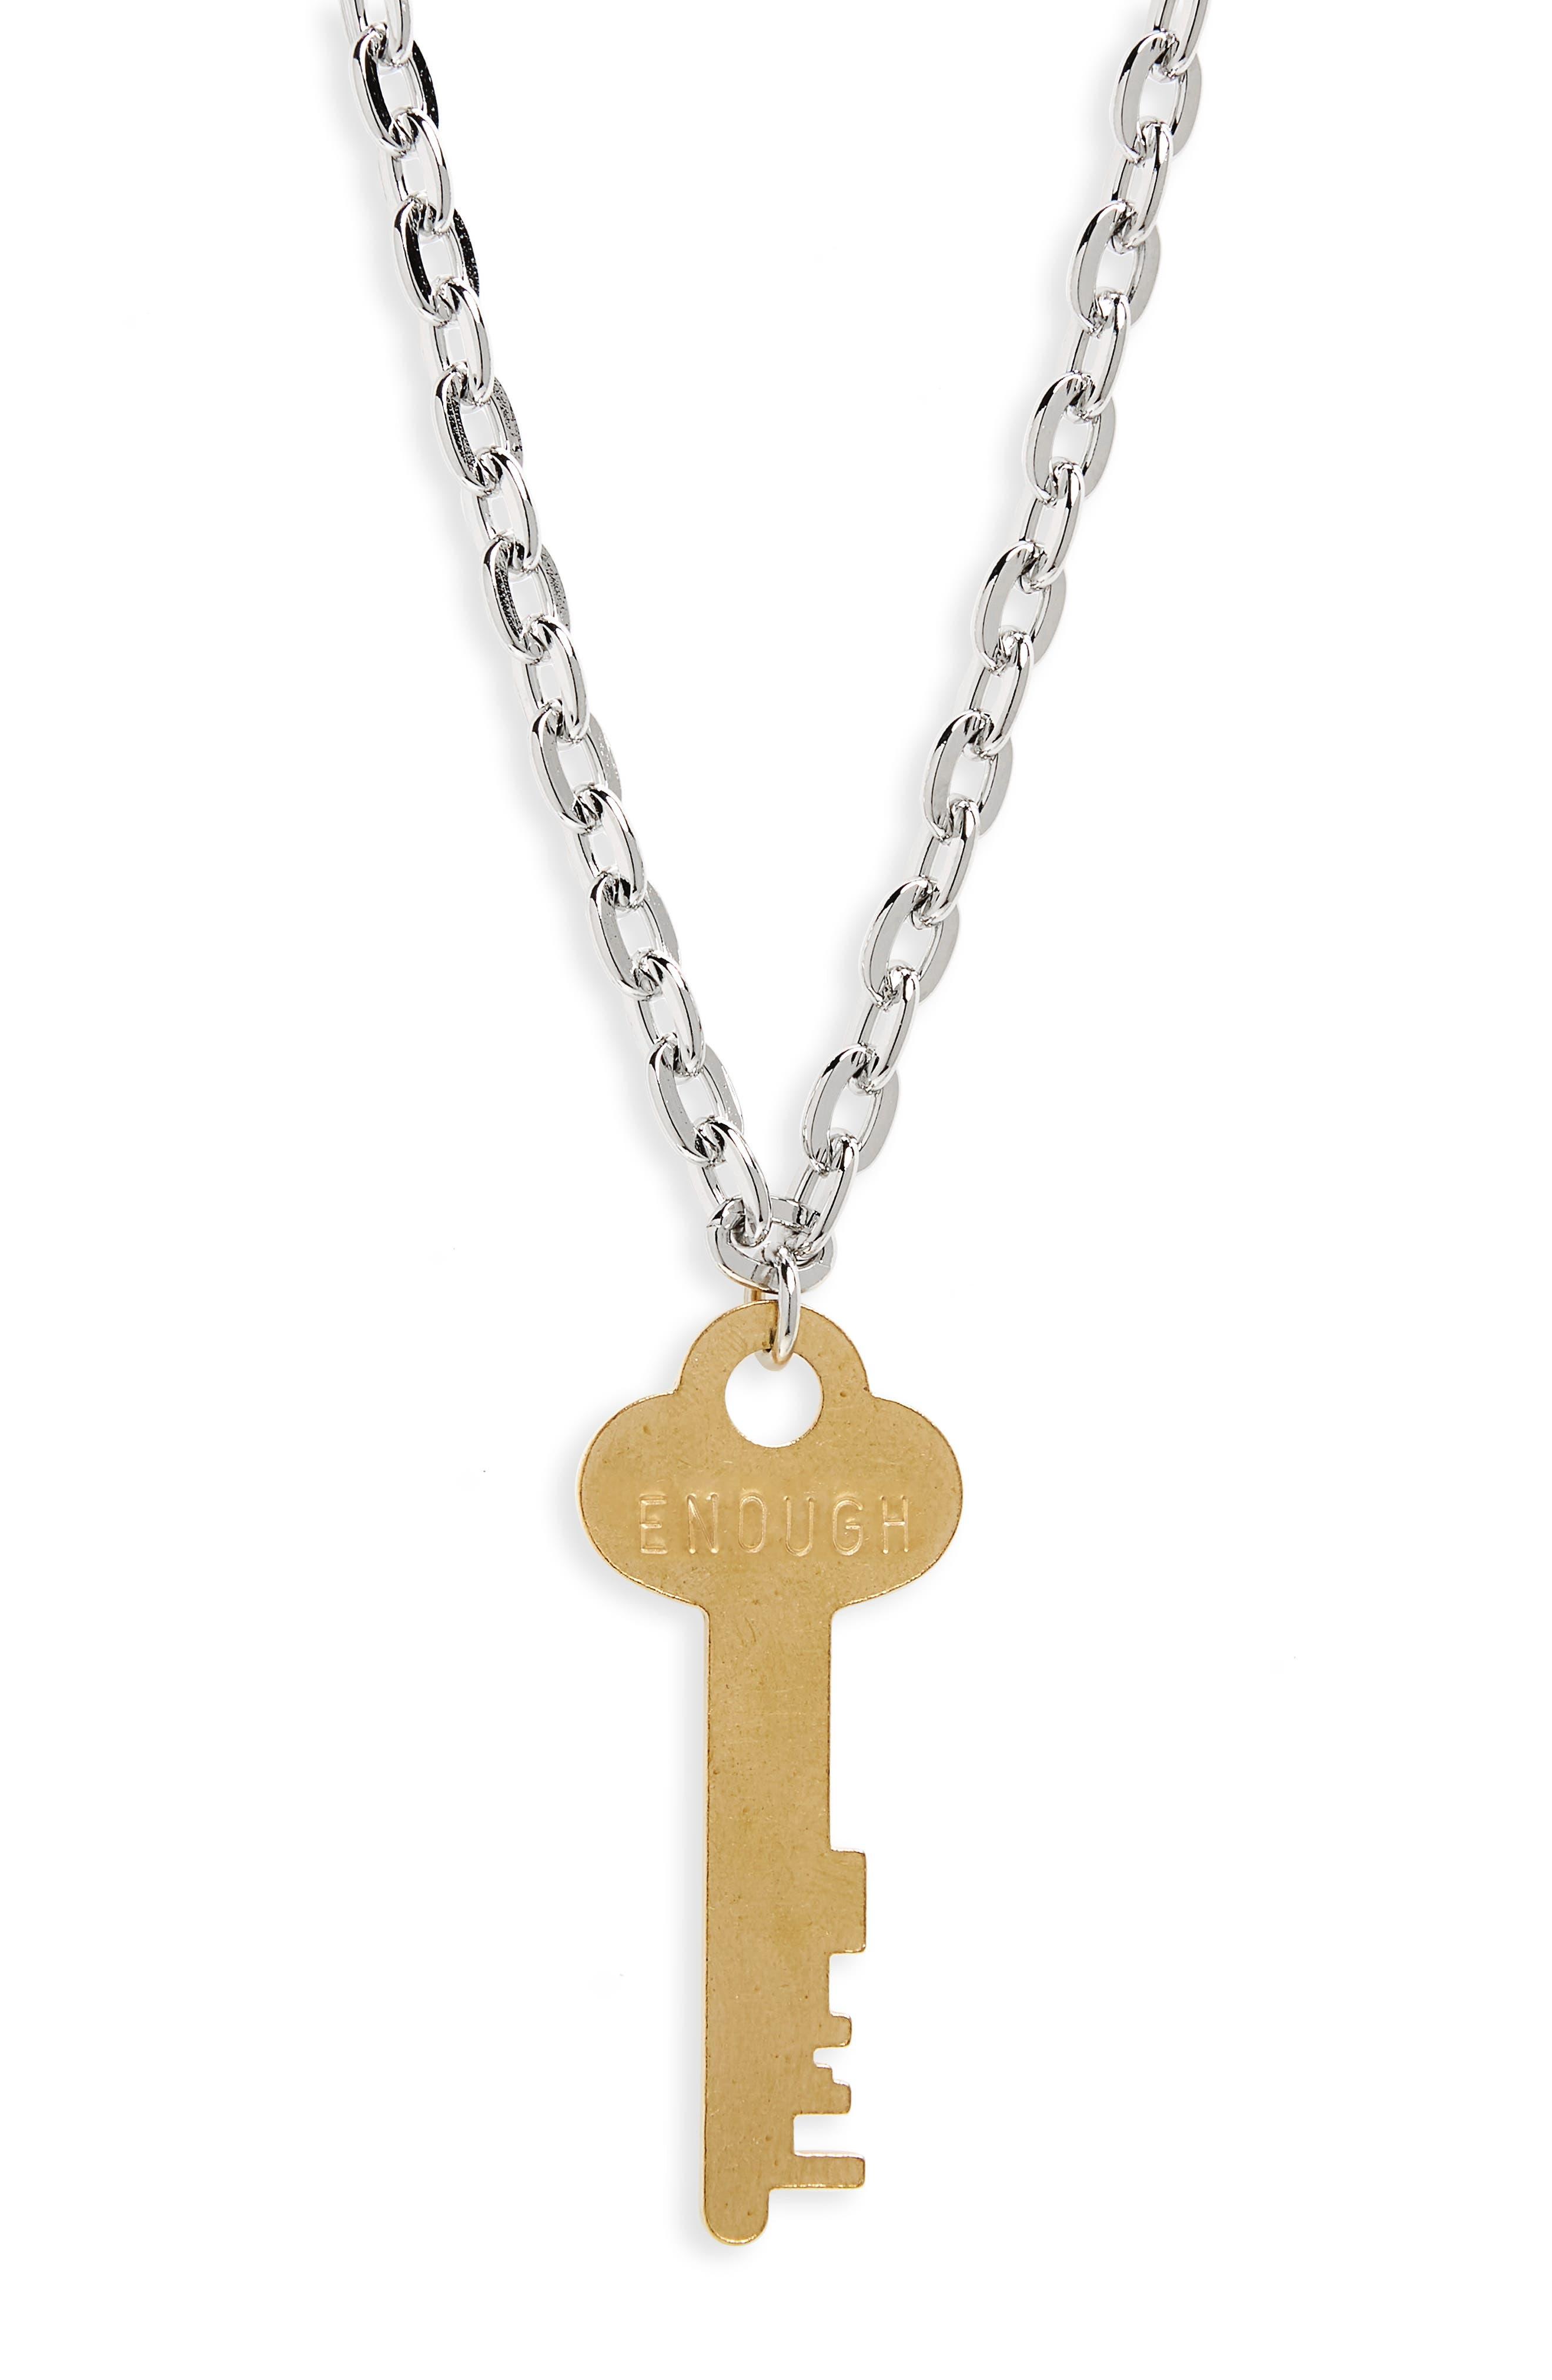 I Am Enough Key Charm Necklace,                             Alternate thumbnail 3, color,                             Silver/ Gold Key